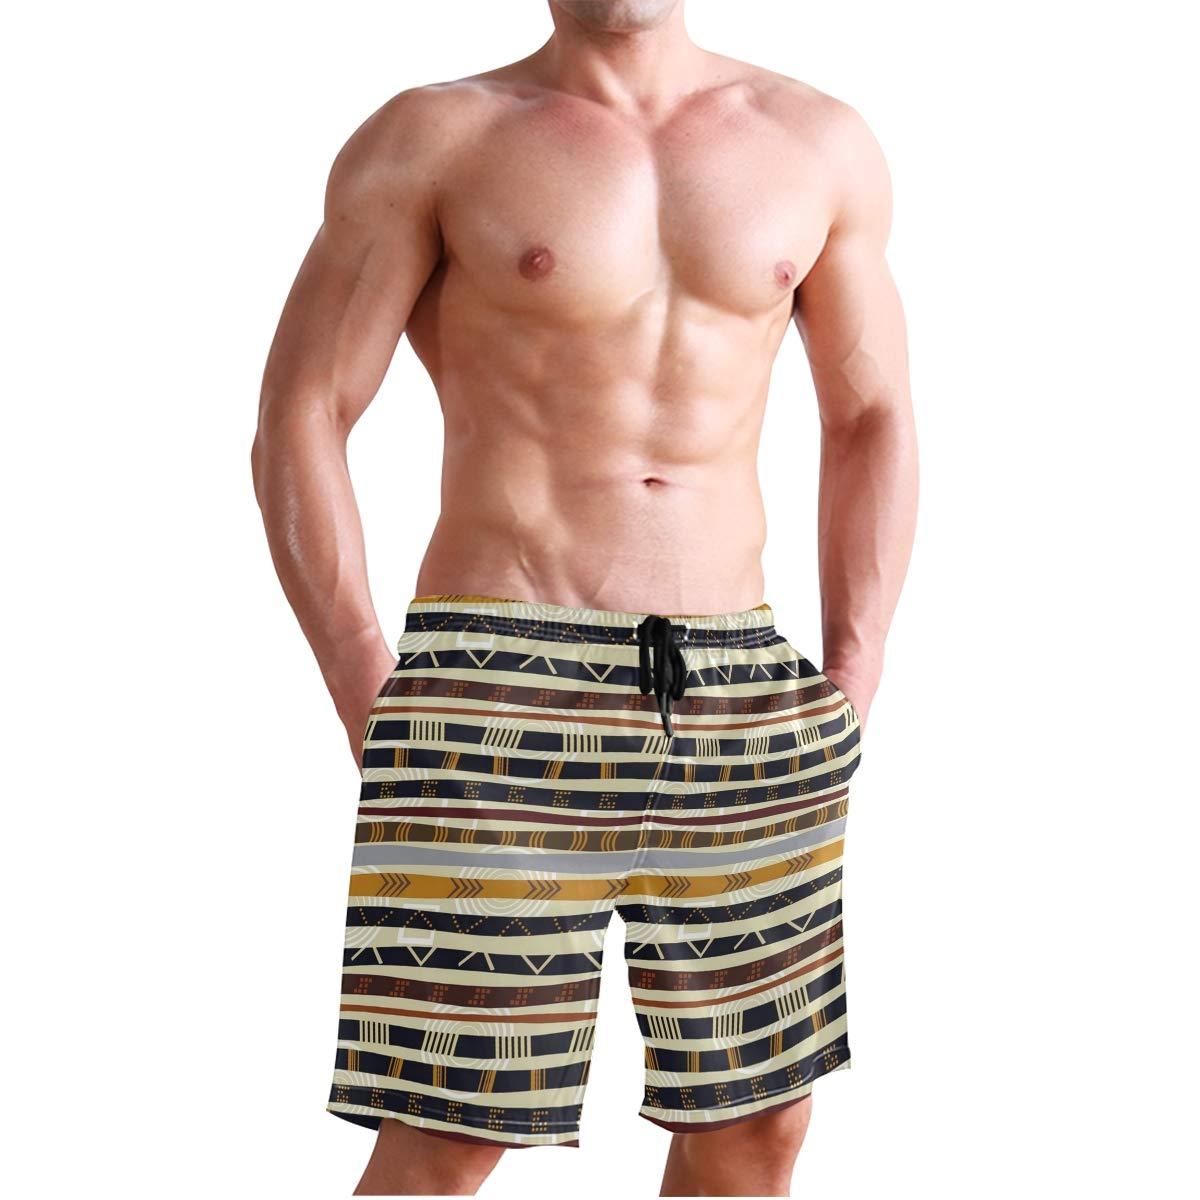 KVMV Ethnic African Trippy Geometric Forms Primitive Heritage Wild Ear 5size Beach Shorts